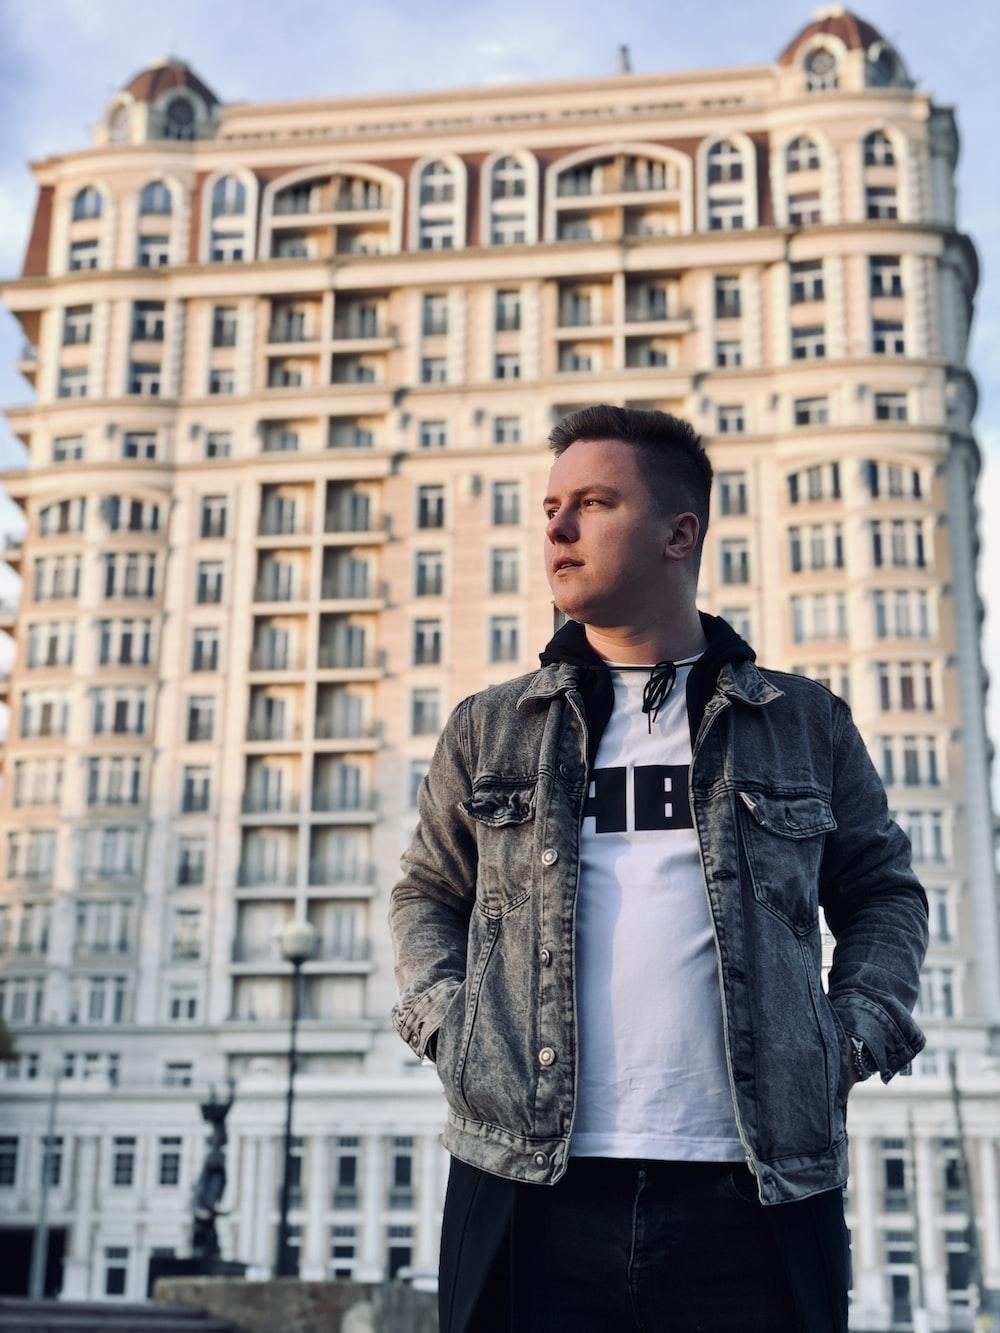 man stands near building